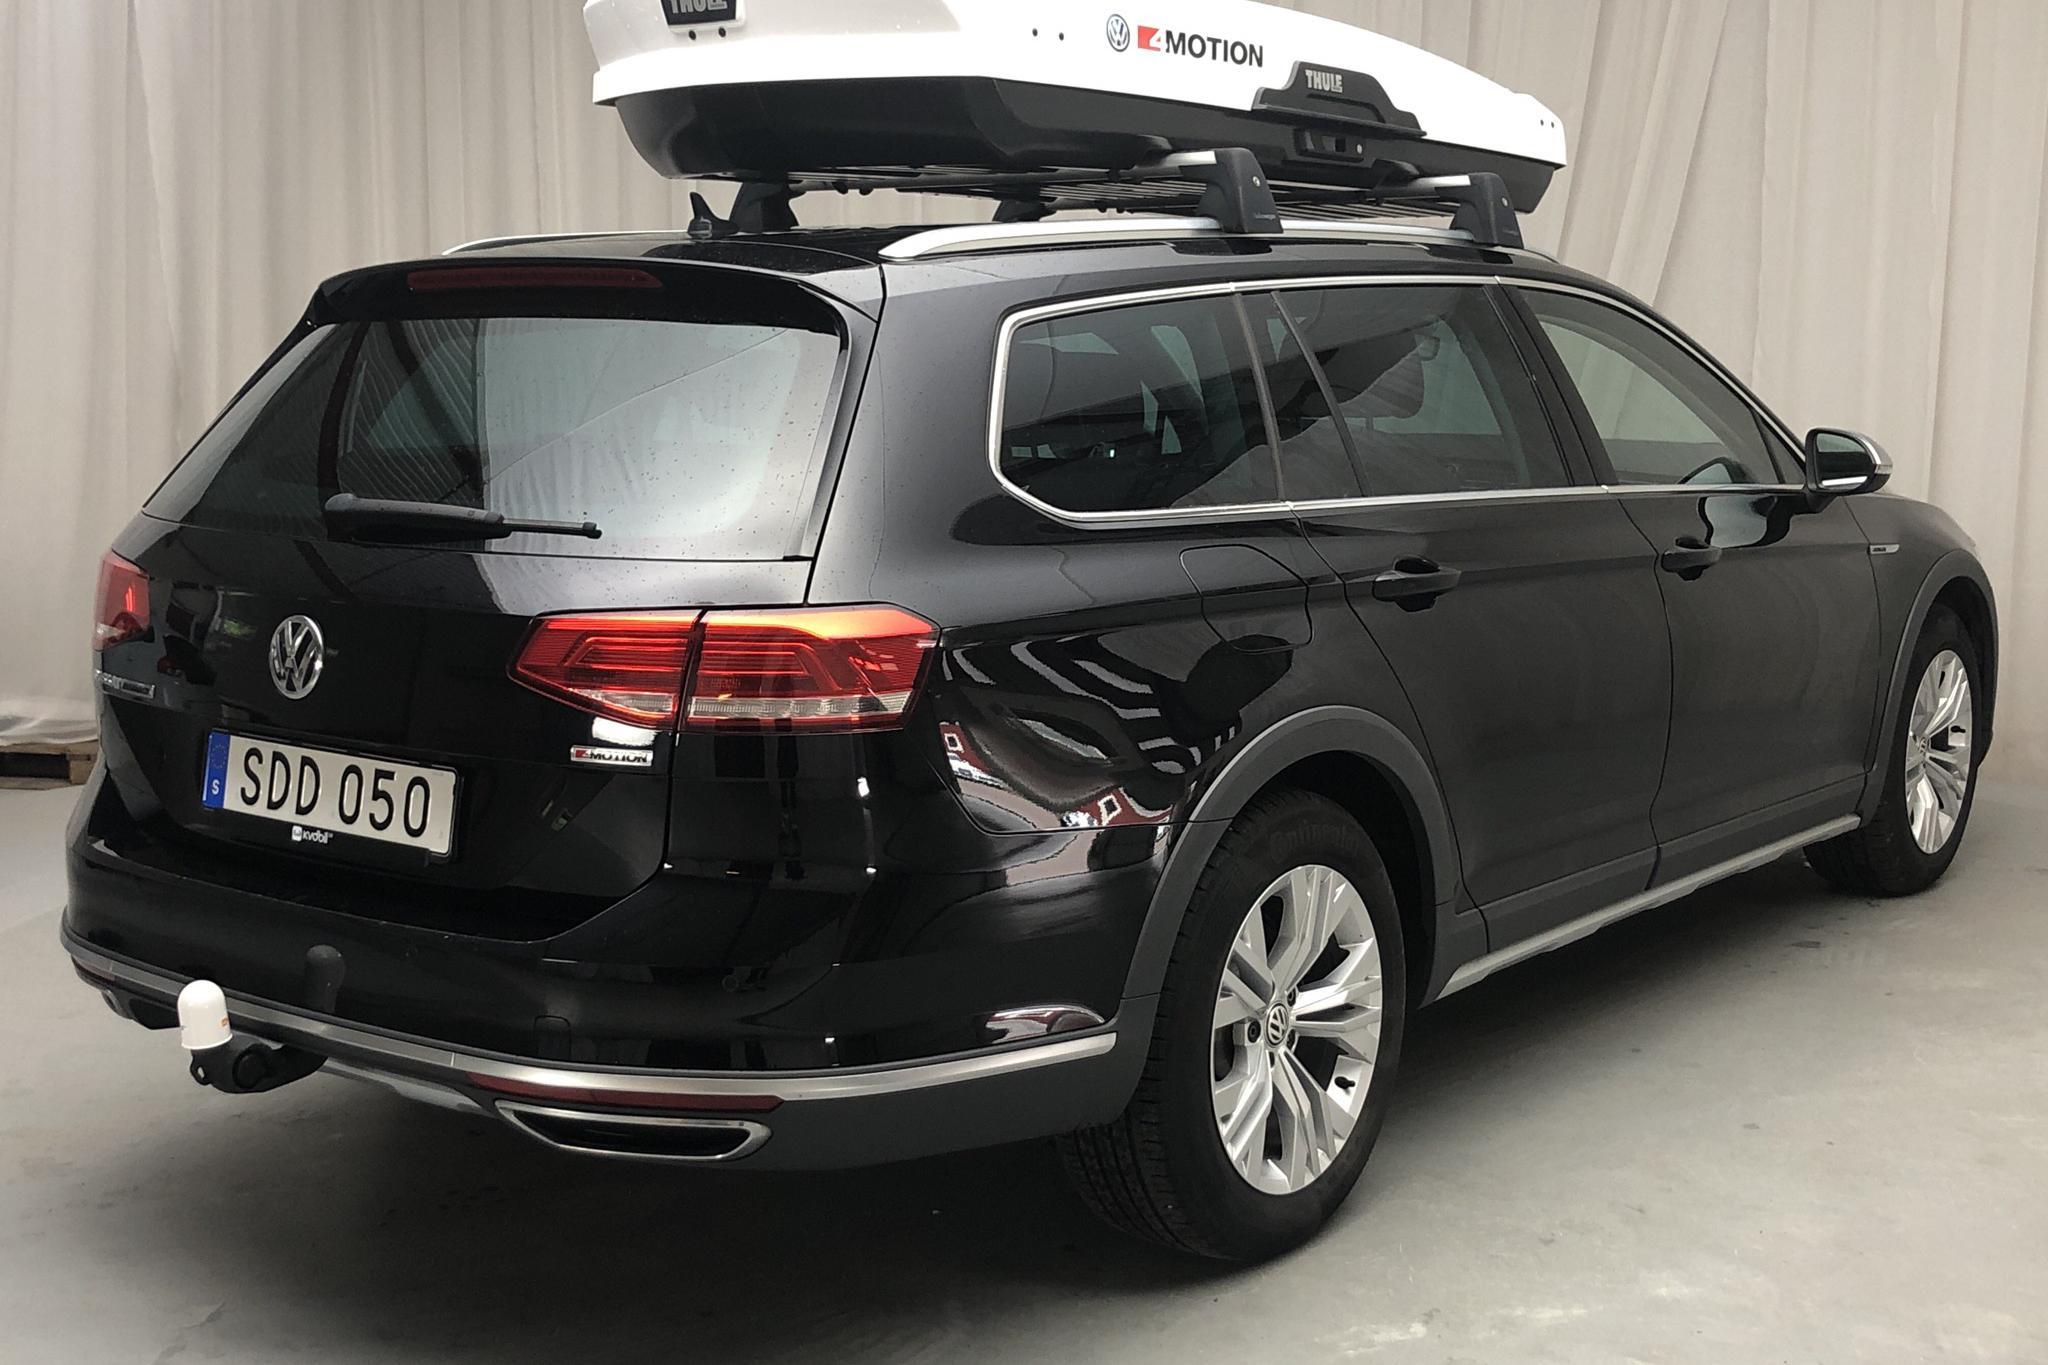 VW Passat Alltrack 2.0 TDI Sportscombi 4MOTION (190hk) - 3 916 mil - Automat - svart - 2018